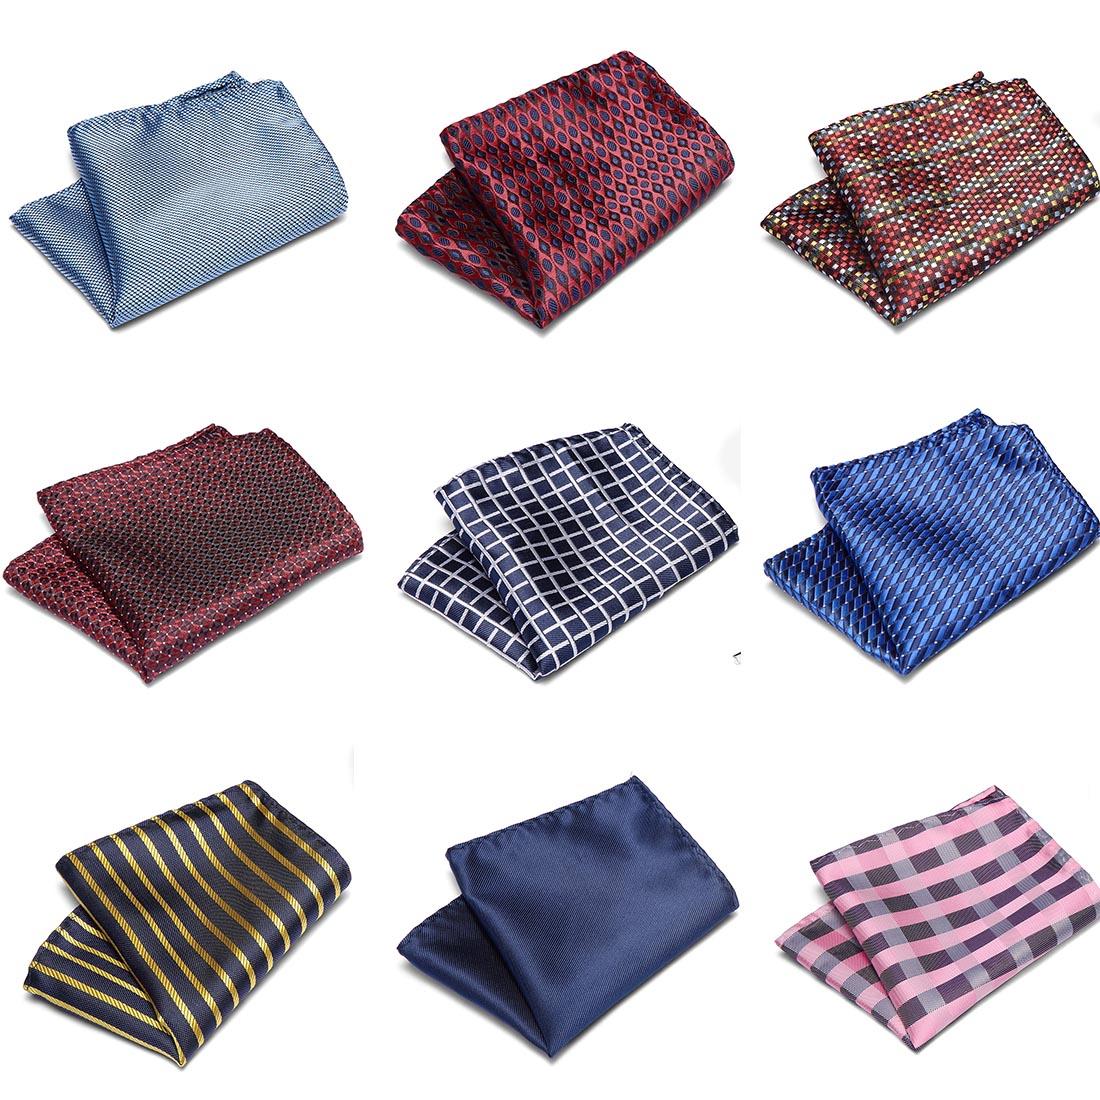 Classic  Hankerchief  Scarves Vintage Silk  Paisley Hankies Men's Pocket Square Handkerchiefs Chest Towel